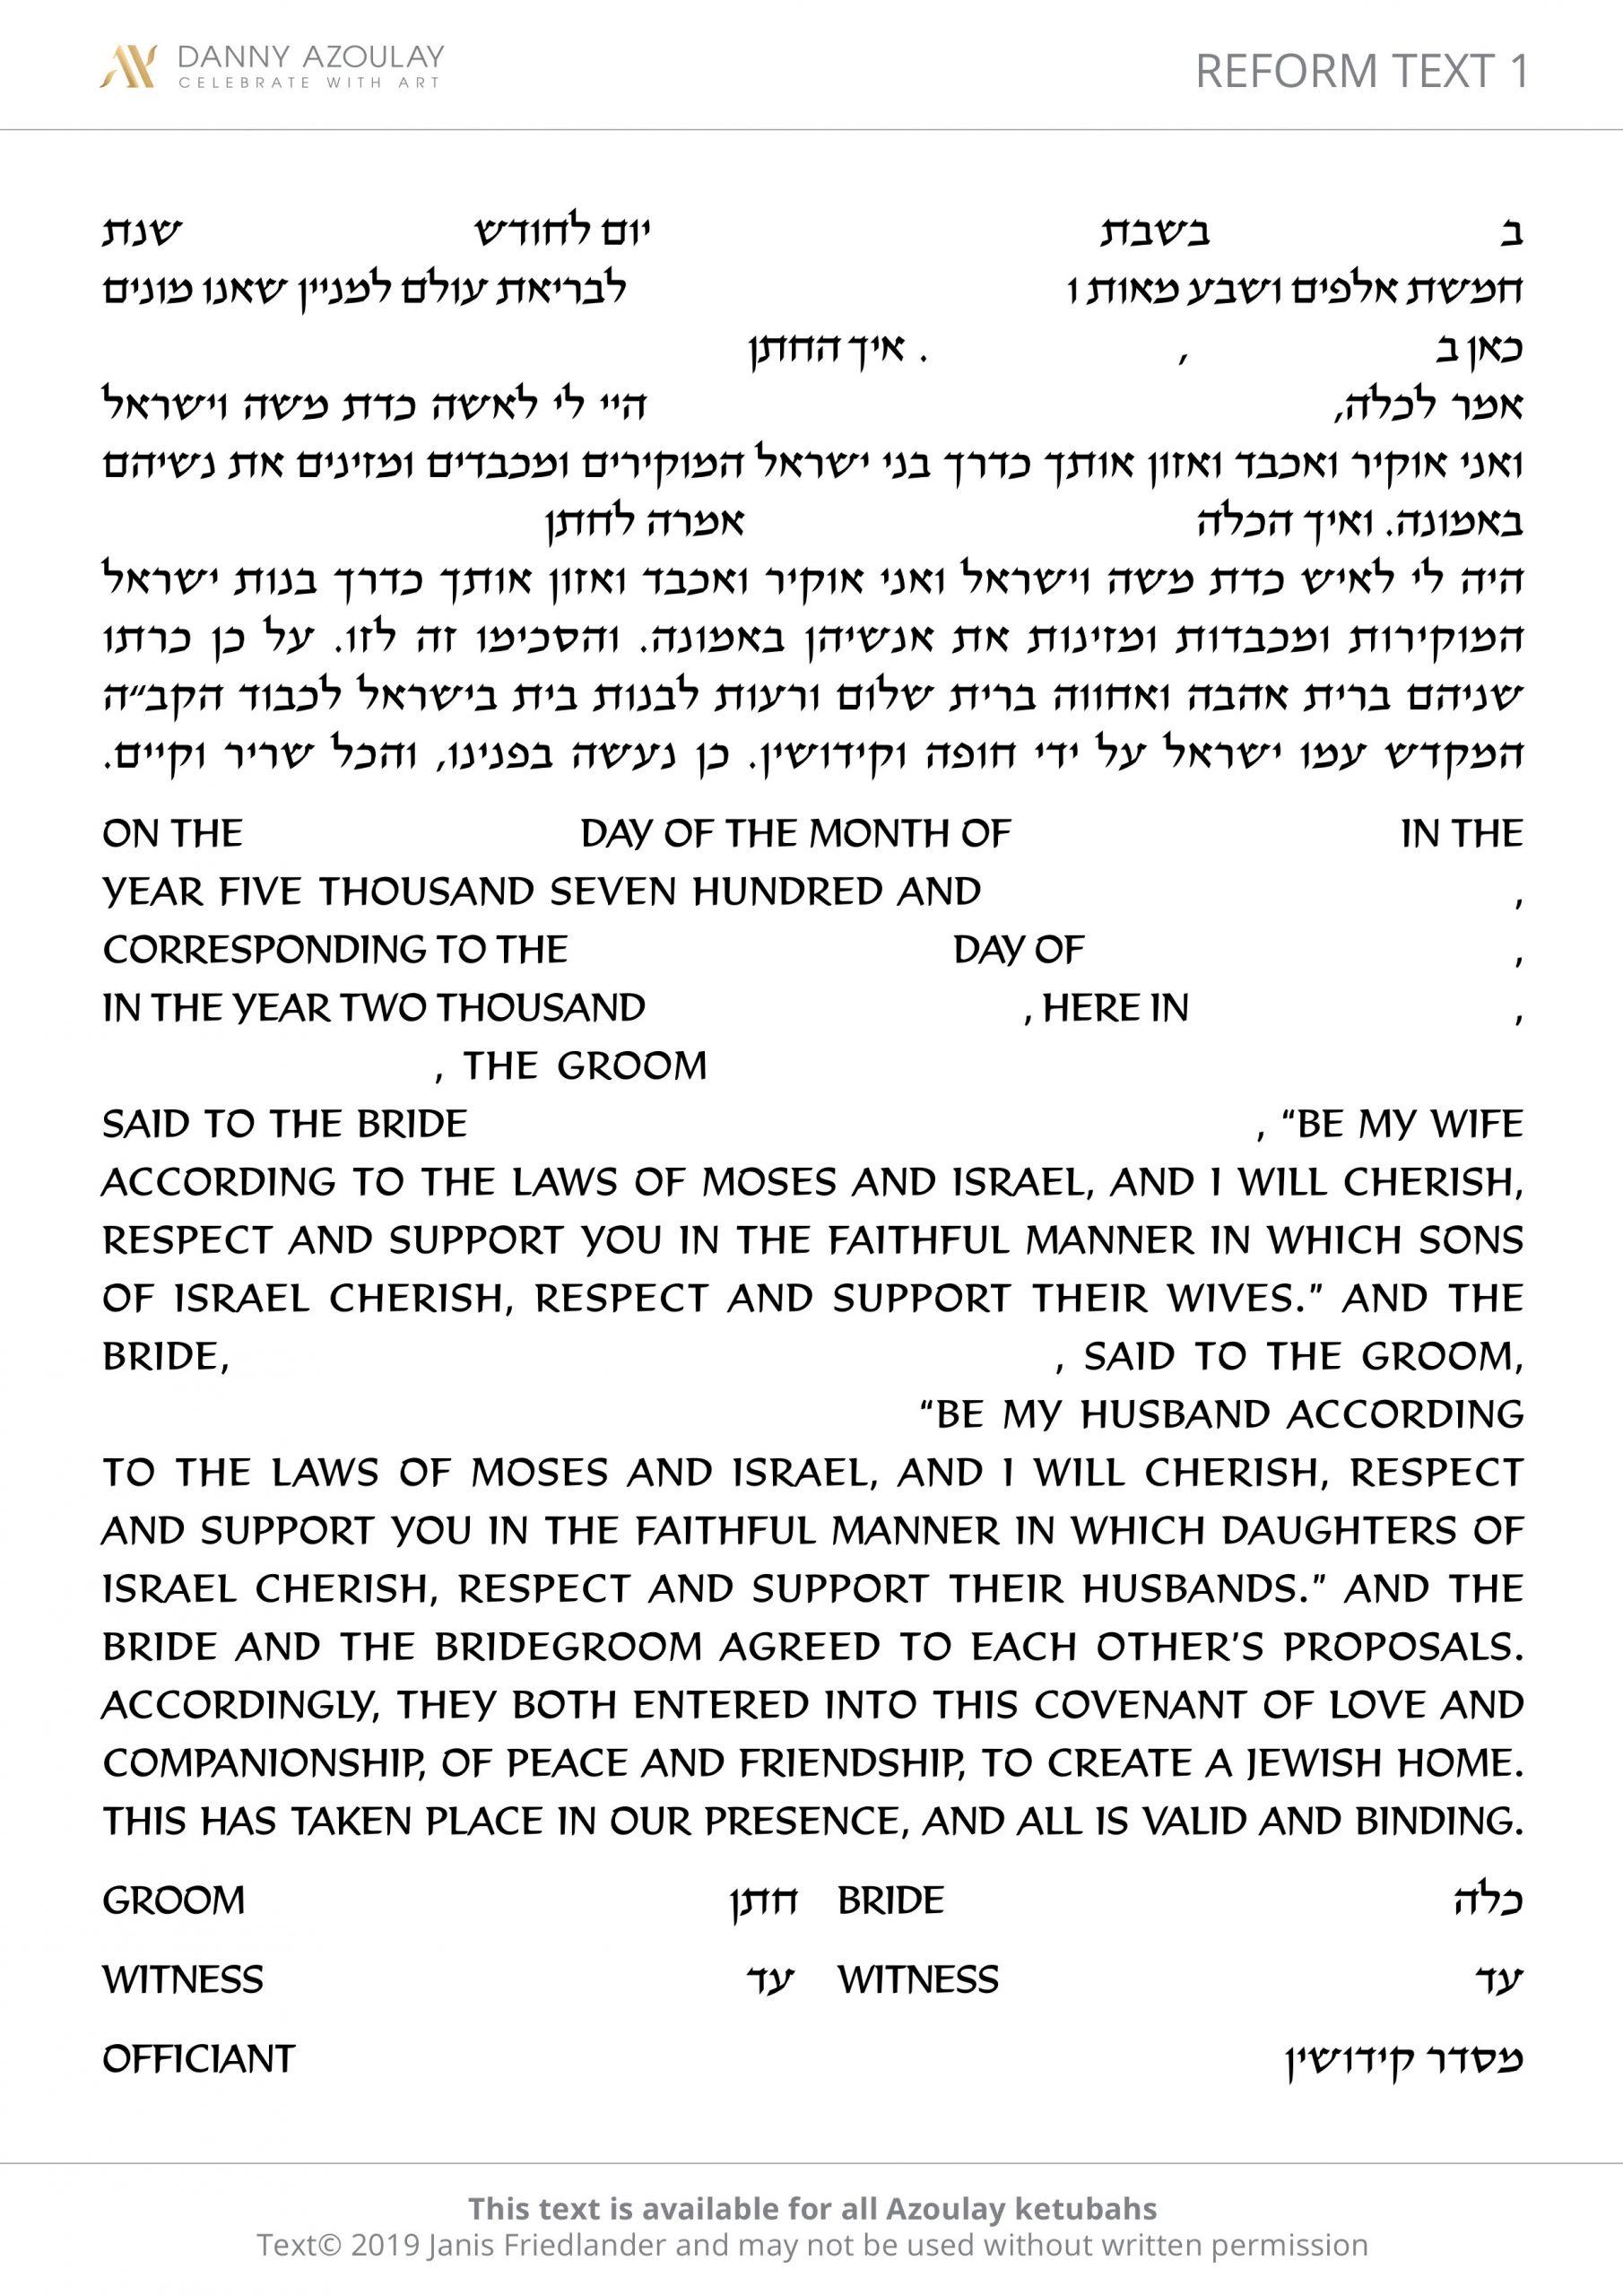 Reform Text 1